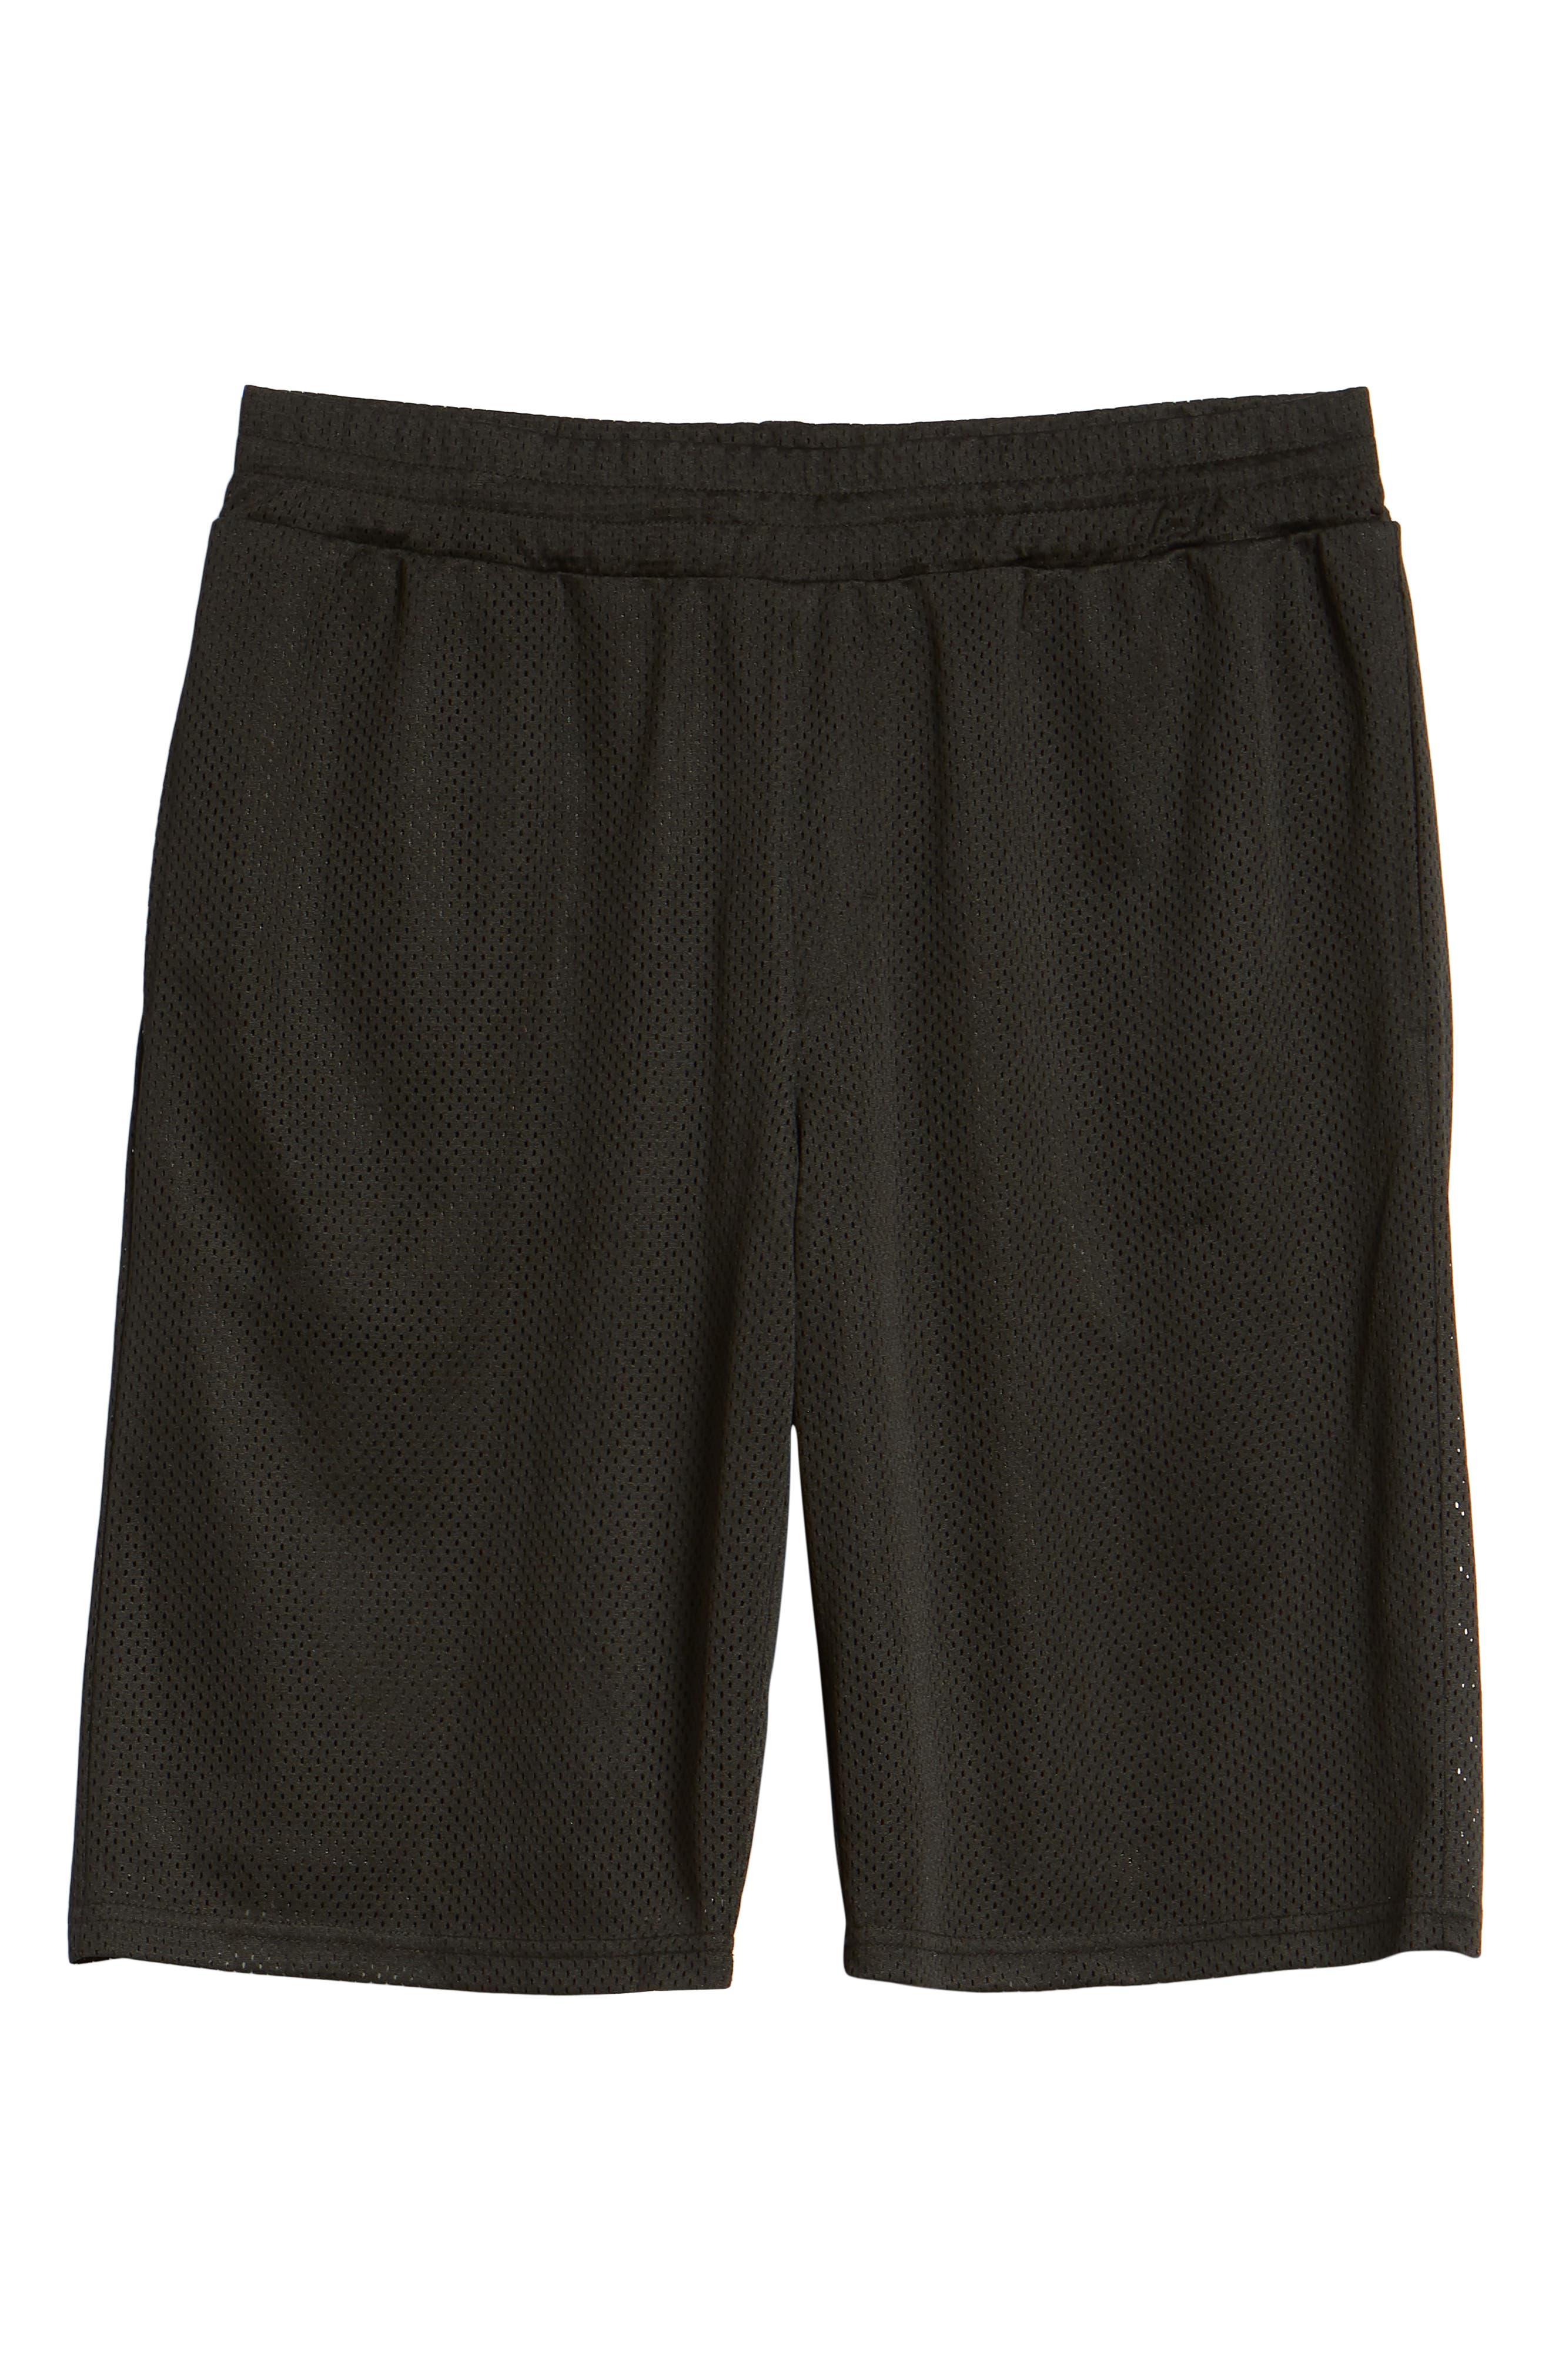 Basketball Shorts,                             Alternate thumbnail 6, color,                             001